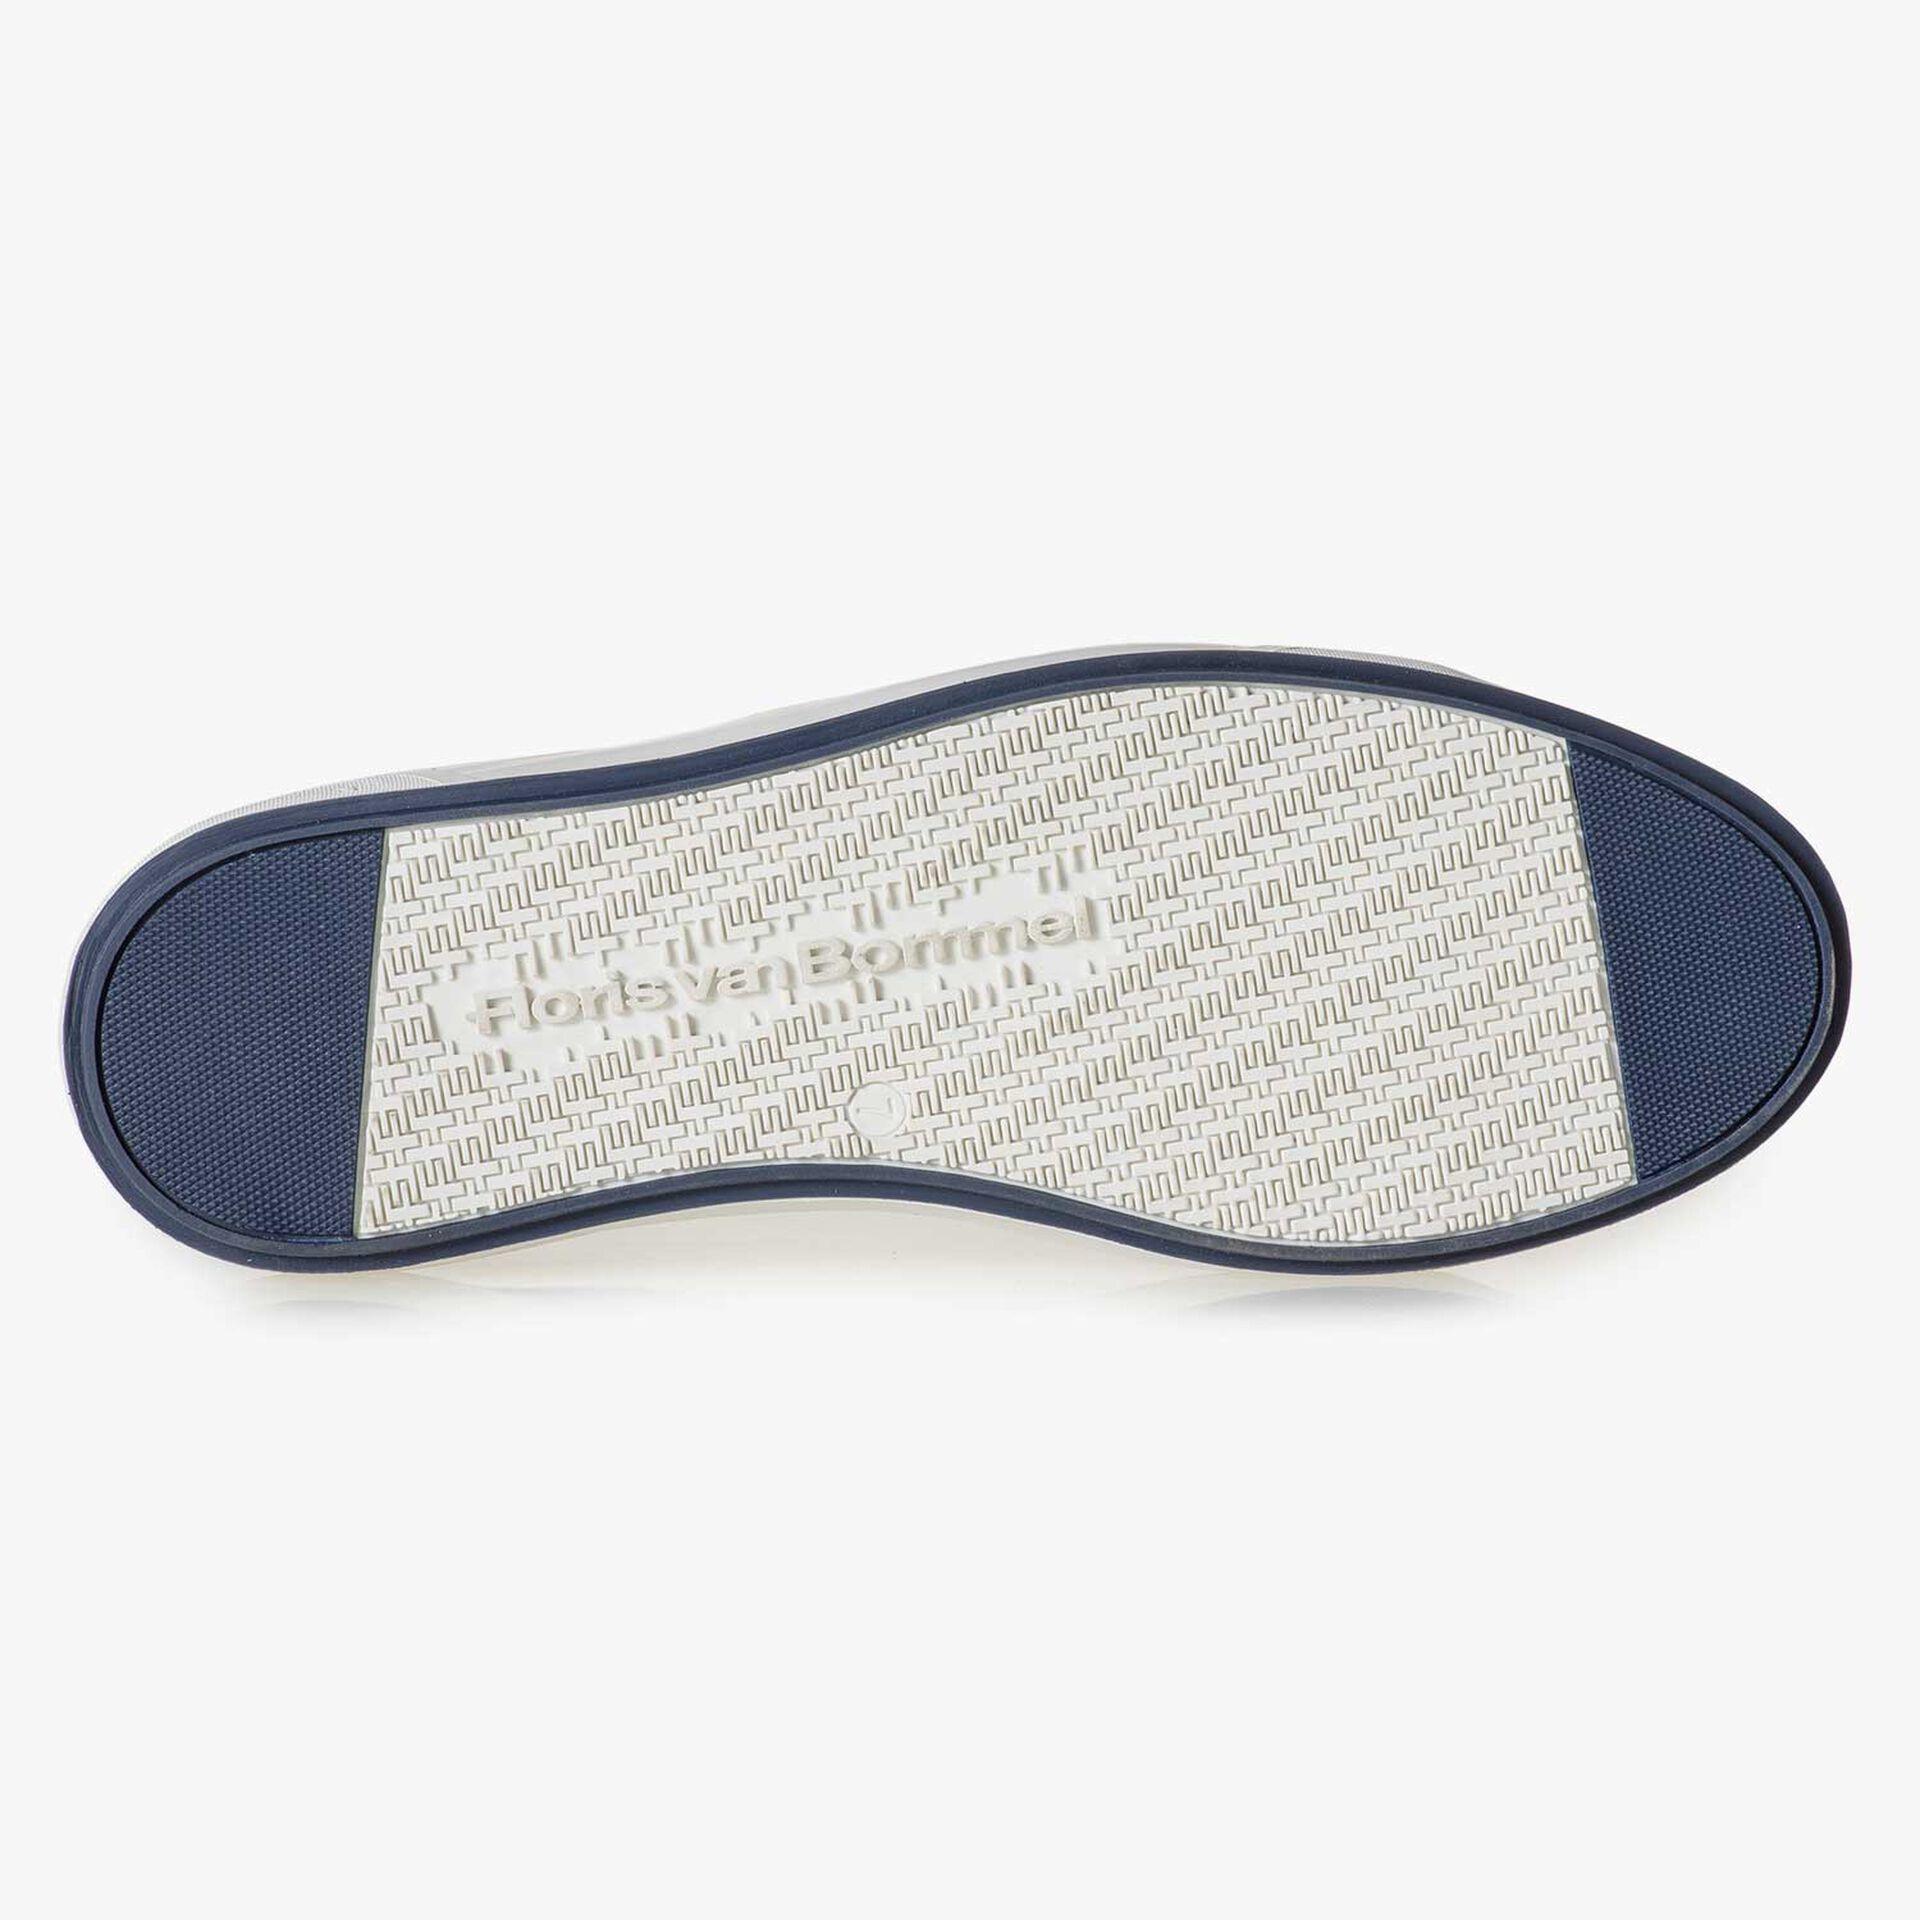 Donkerbruine kalfssuède sneaker met lizardprint